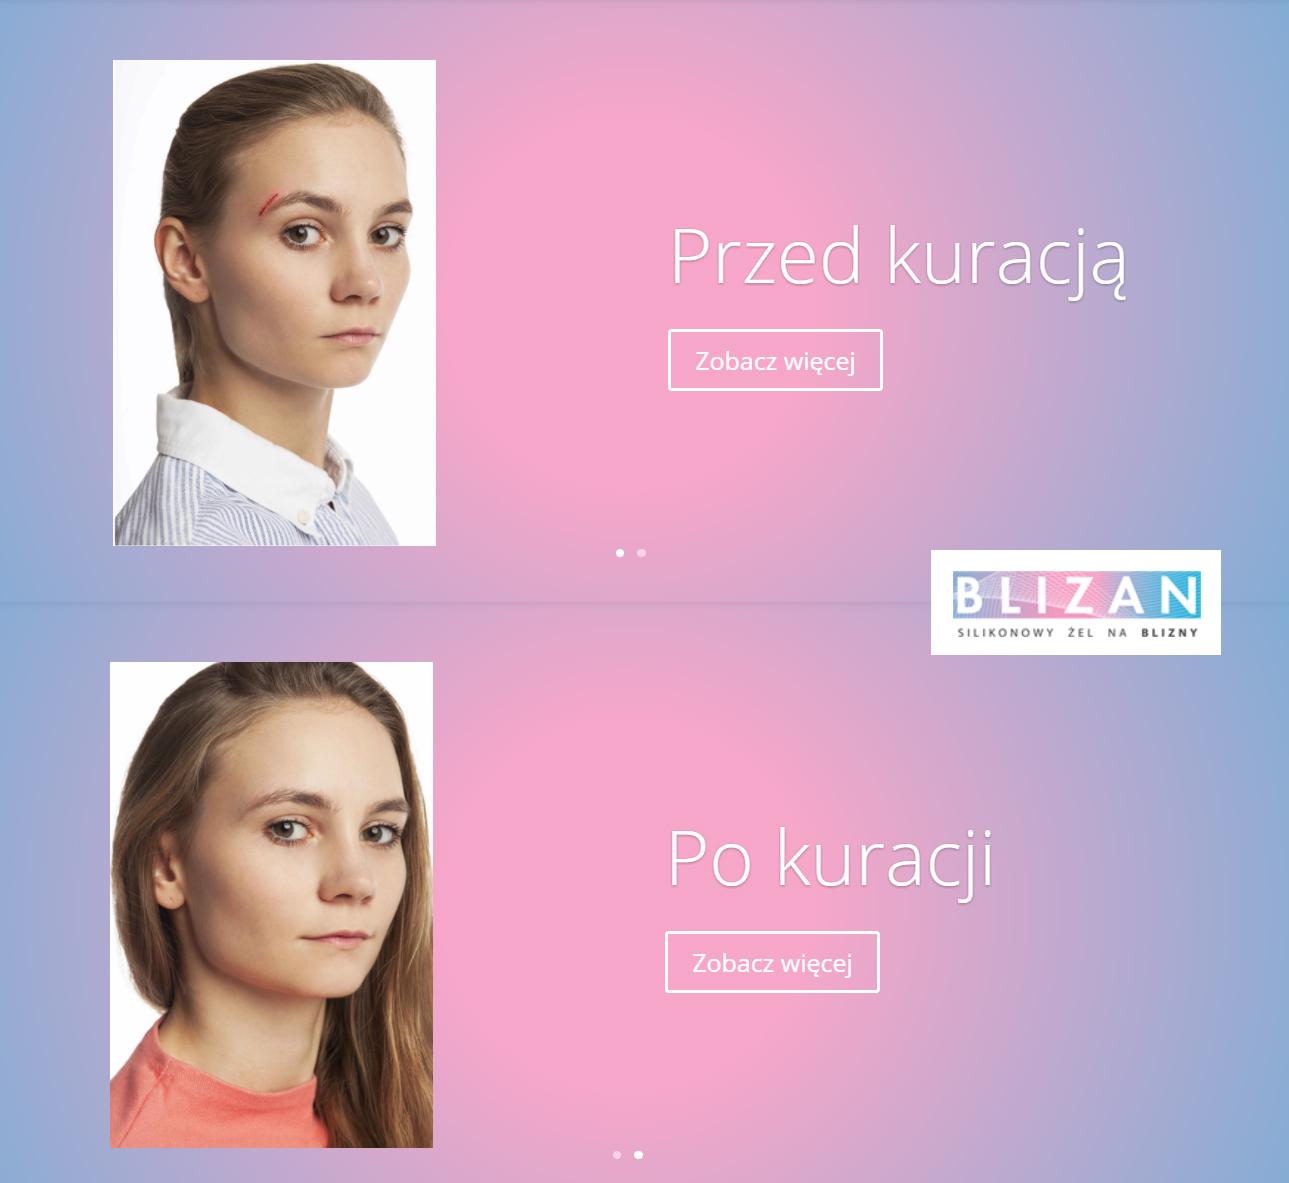 Blizan